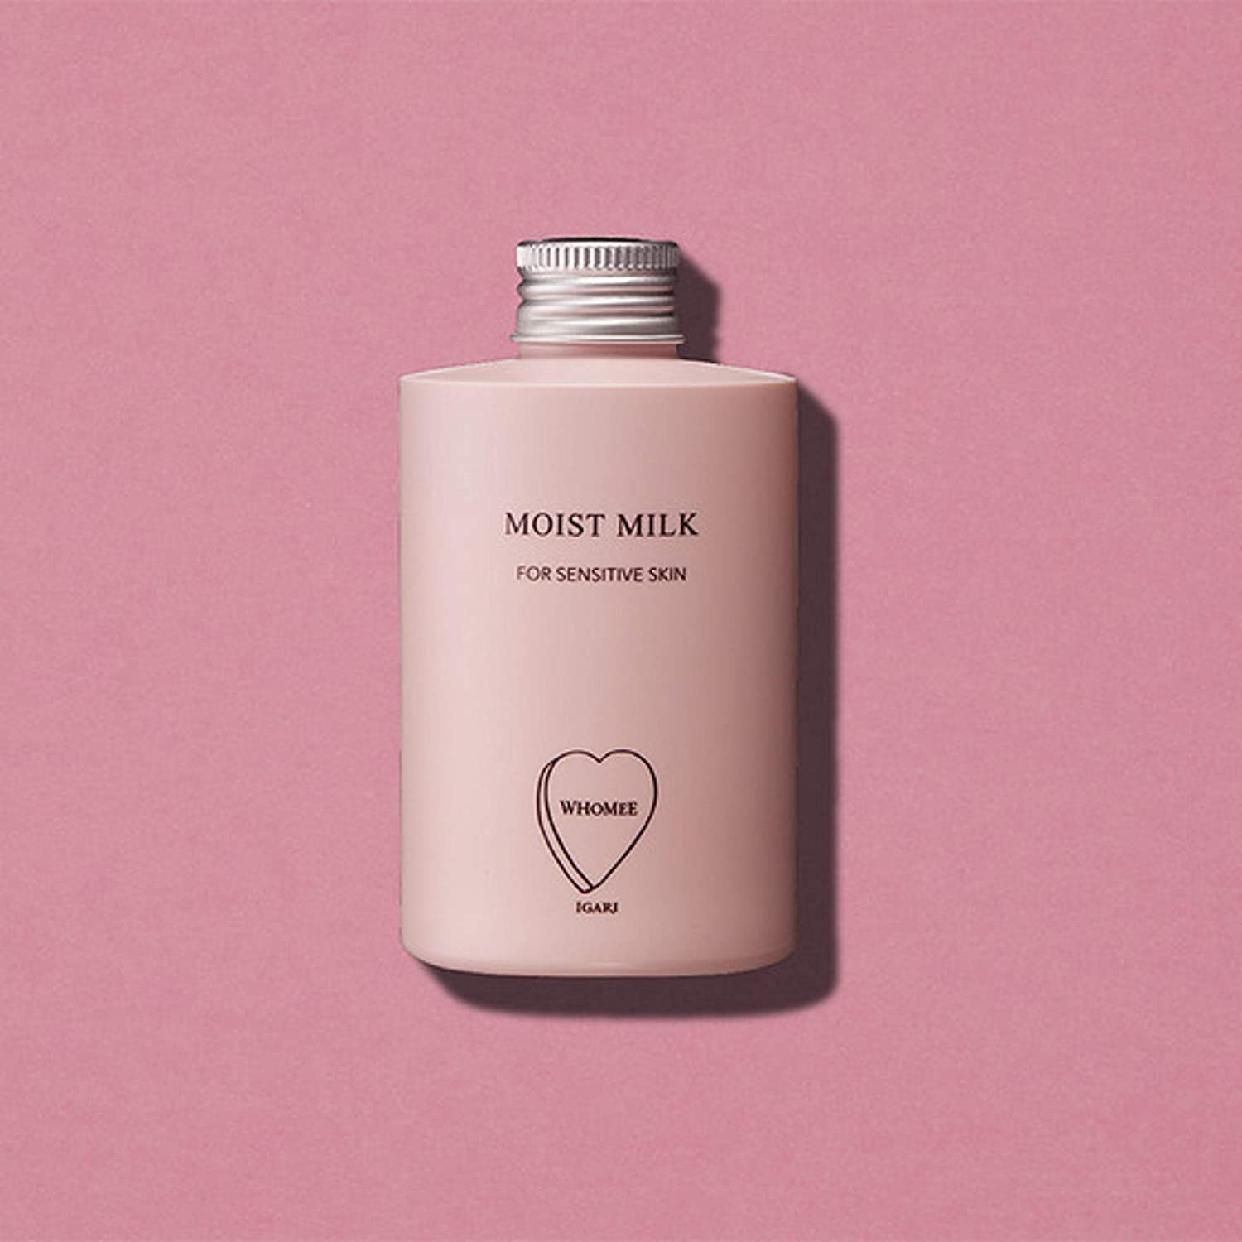 WHOMEE(フーミー) モイストミルクの商品画像11